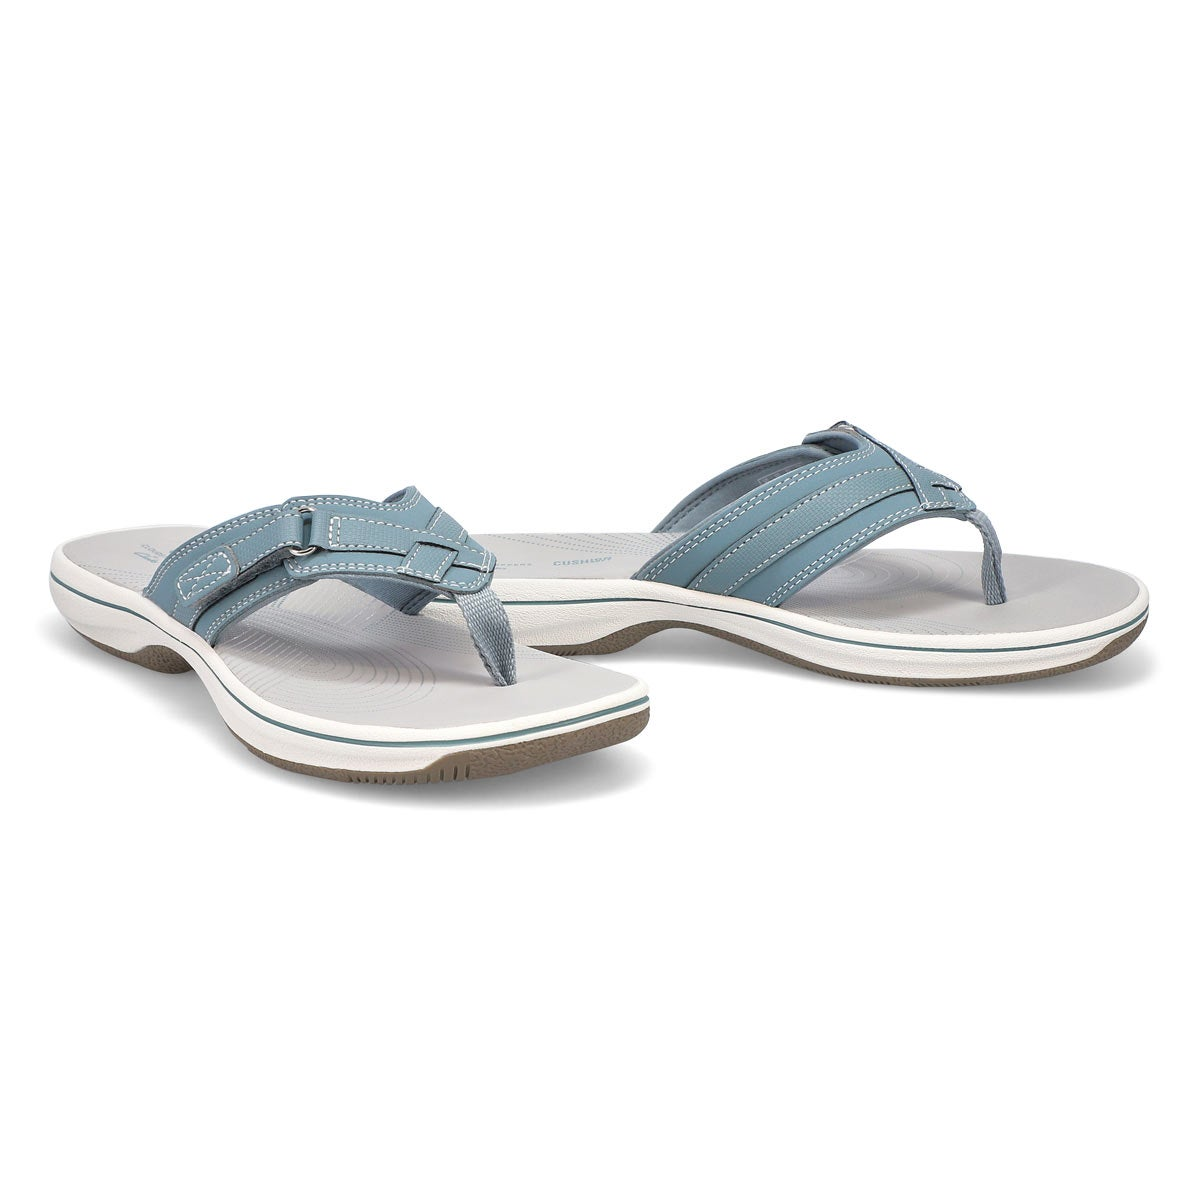 Sandale tong Breeze Sea, bleu, femme